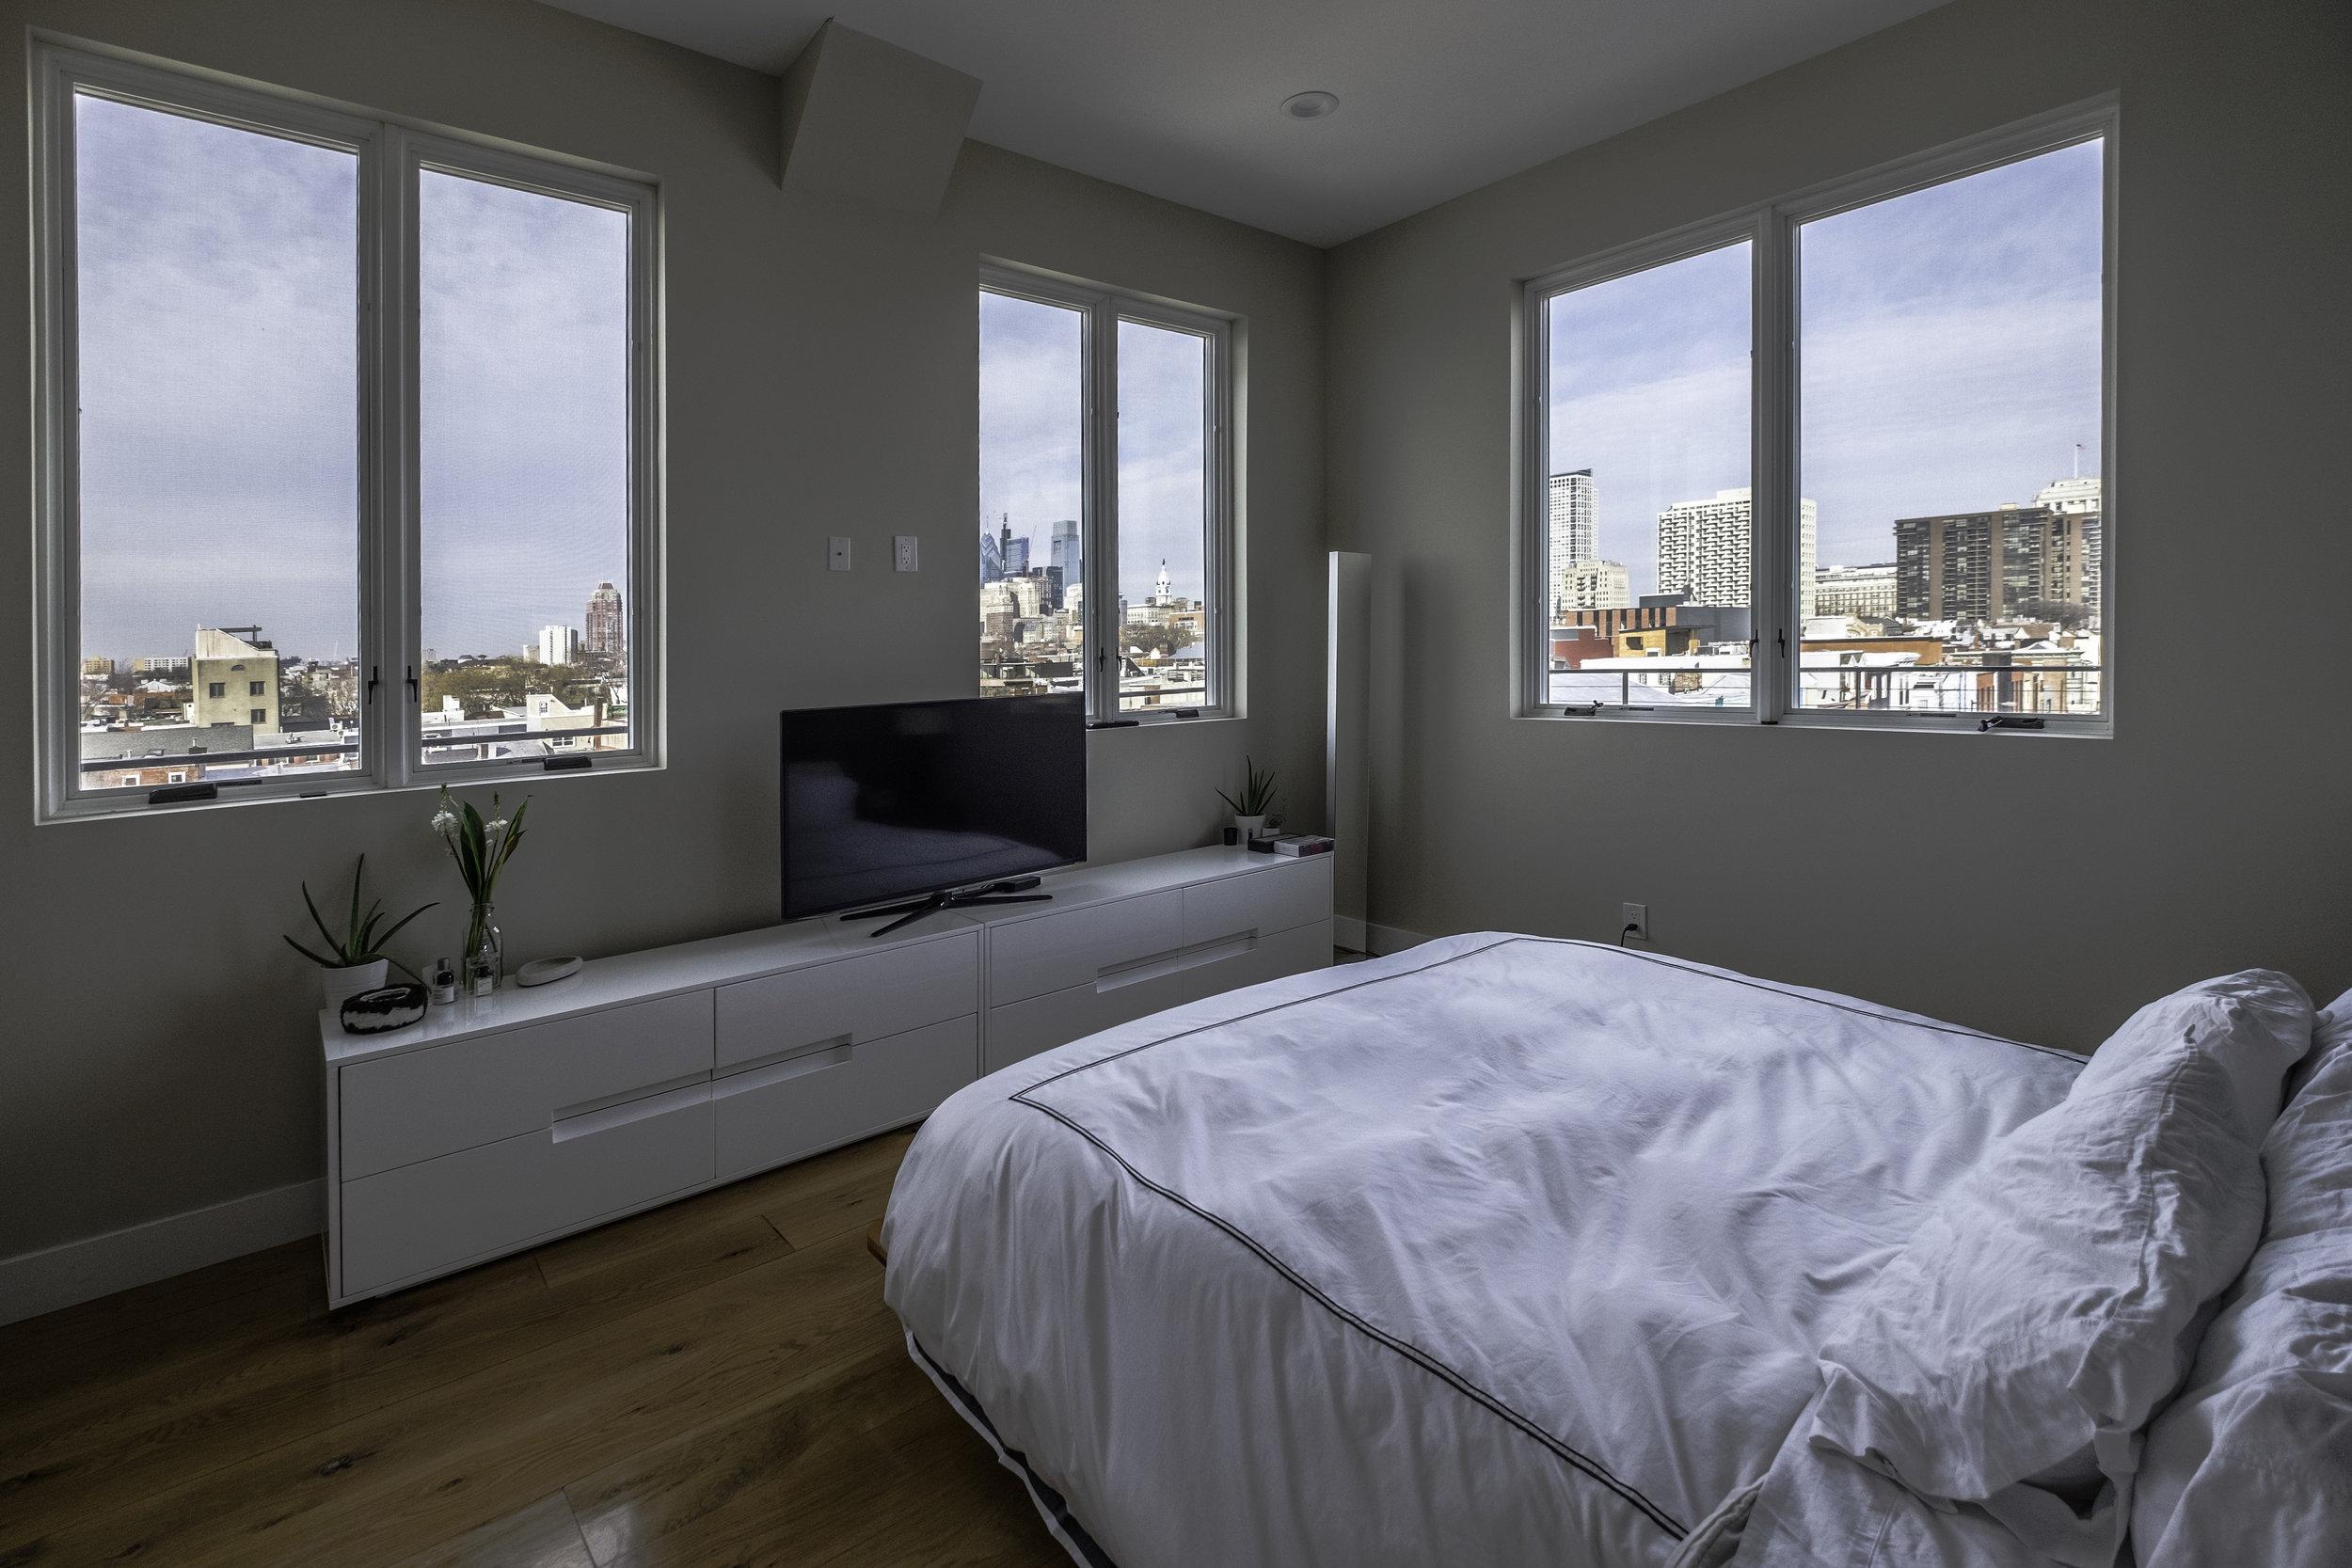 01 Bedroom.jpg